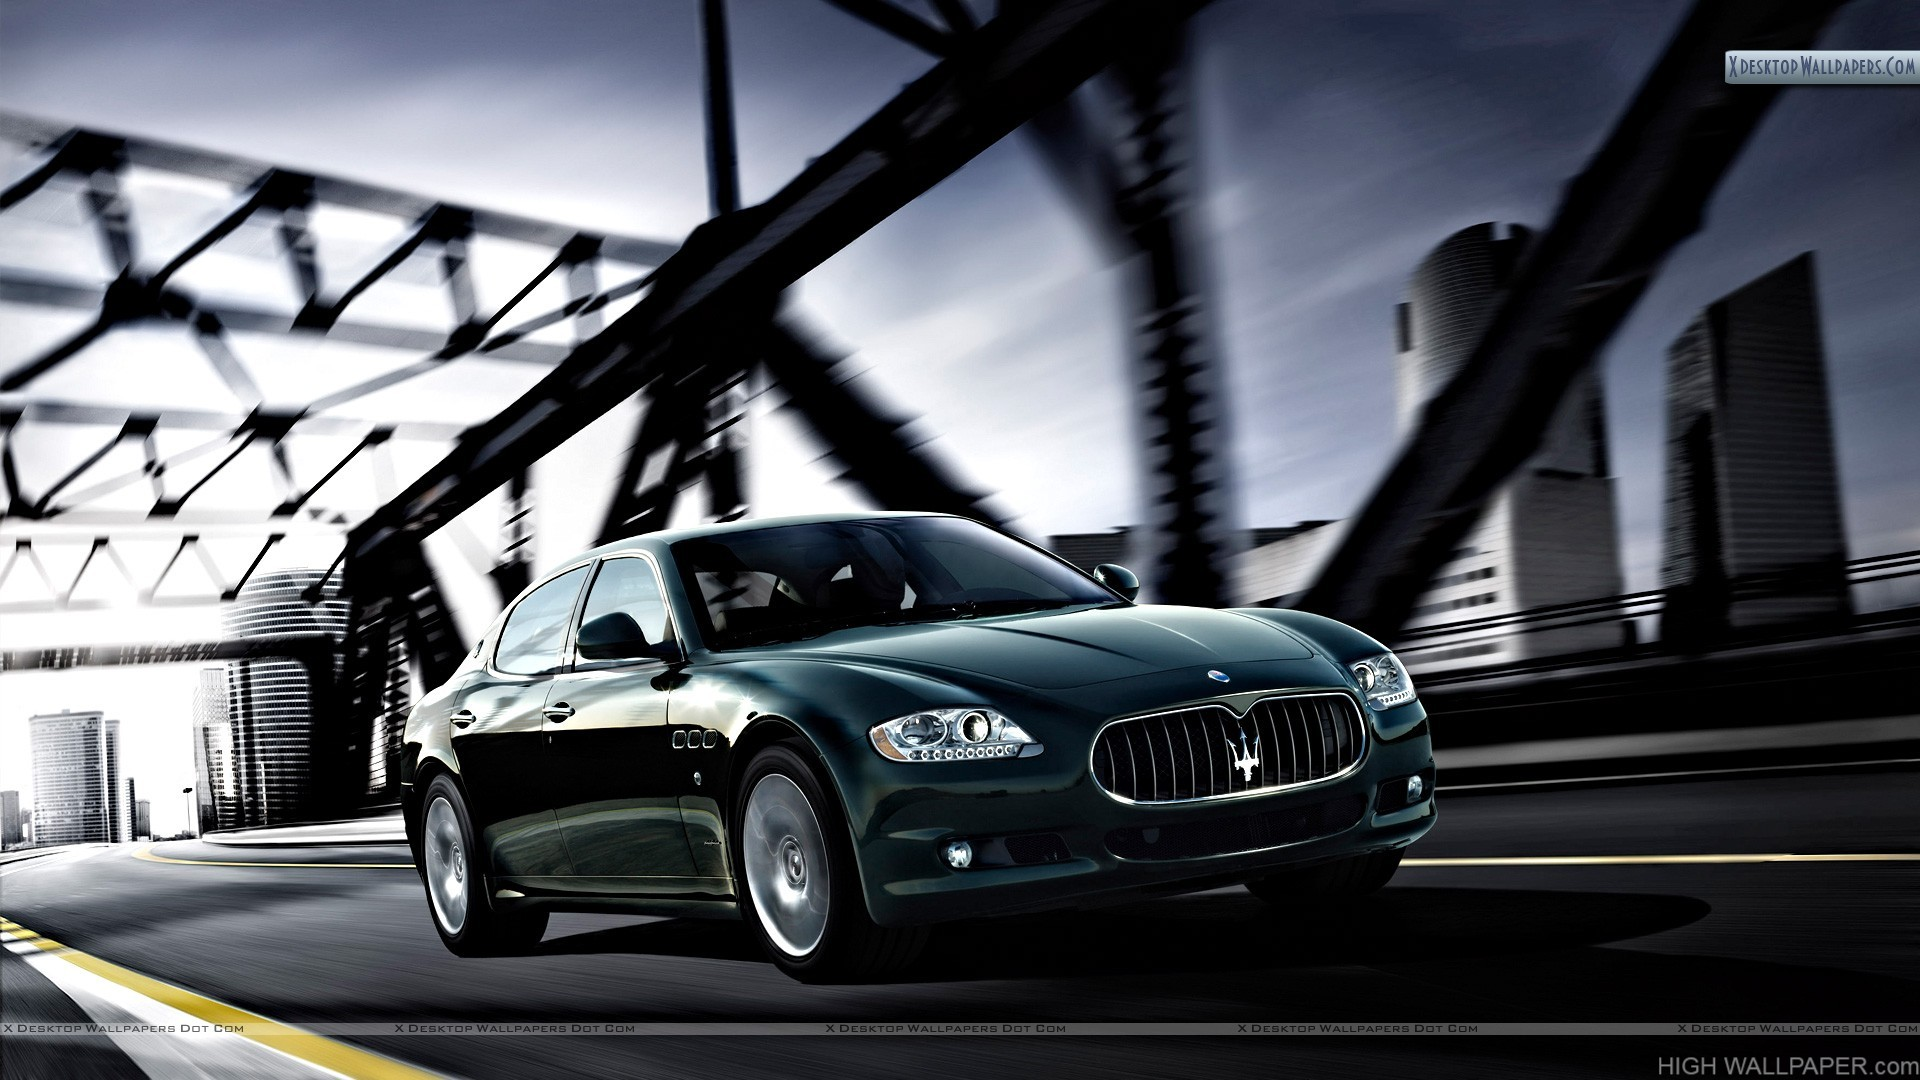 Maserati Quattroporte Running On Bridge